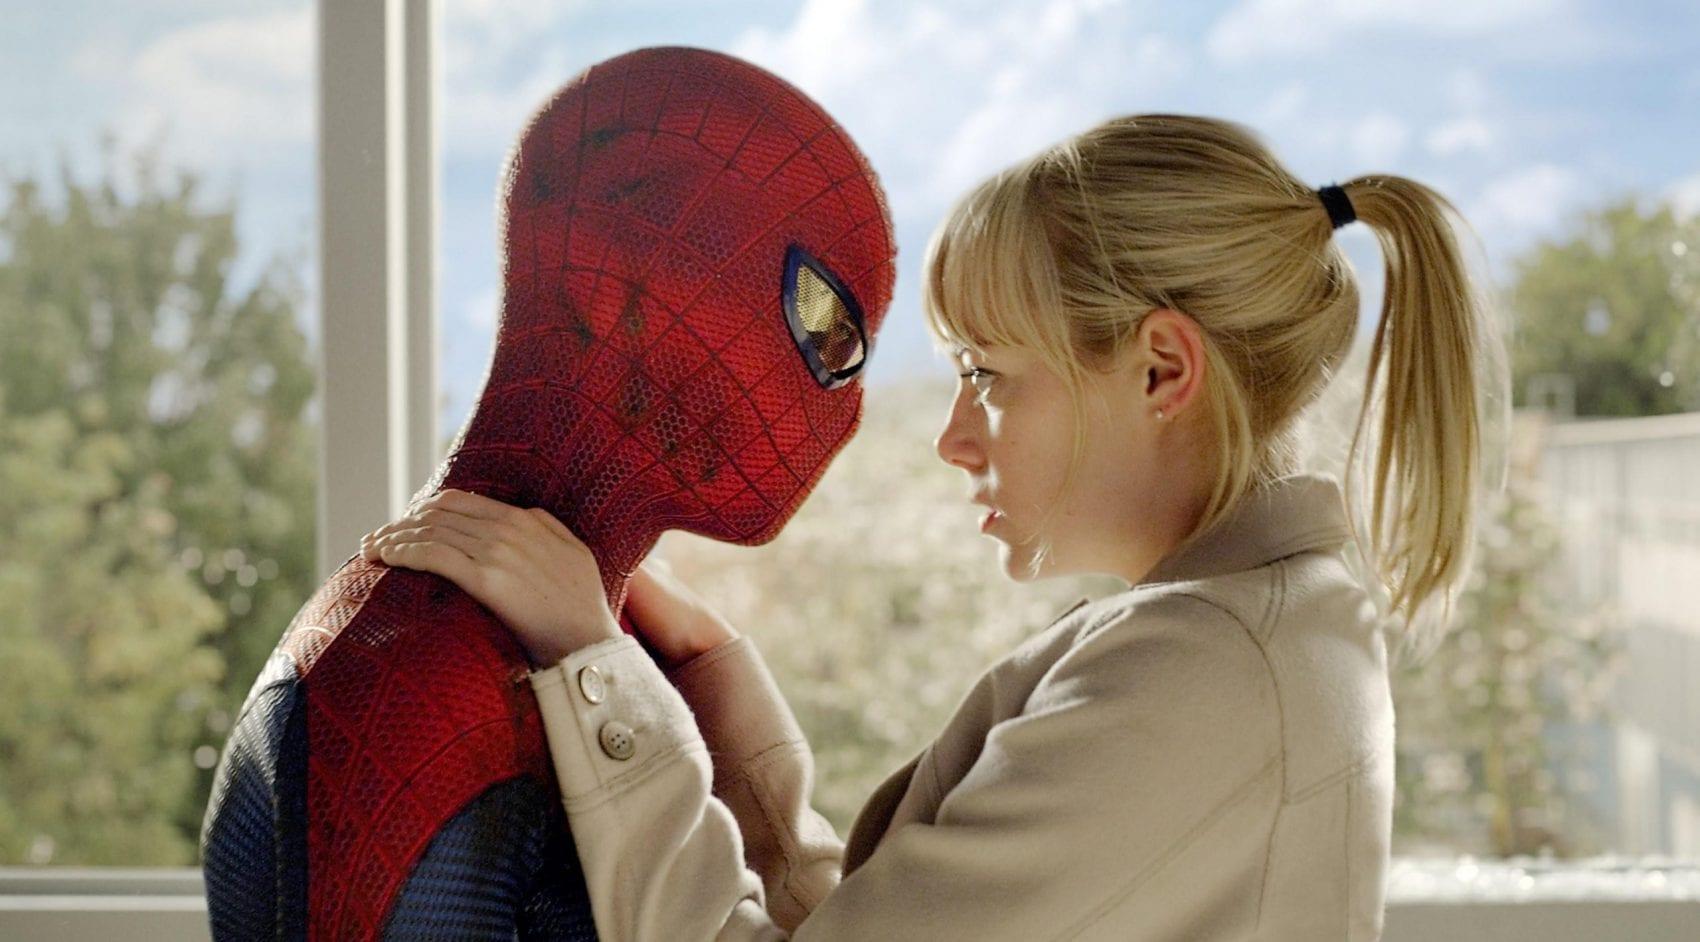 NEWS - Spider-Man The New Avenger Gwen Stacy